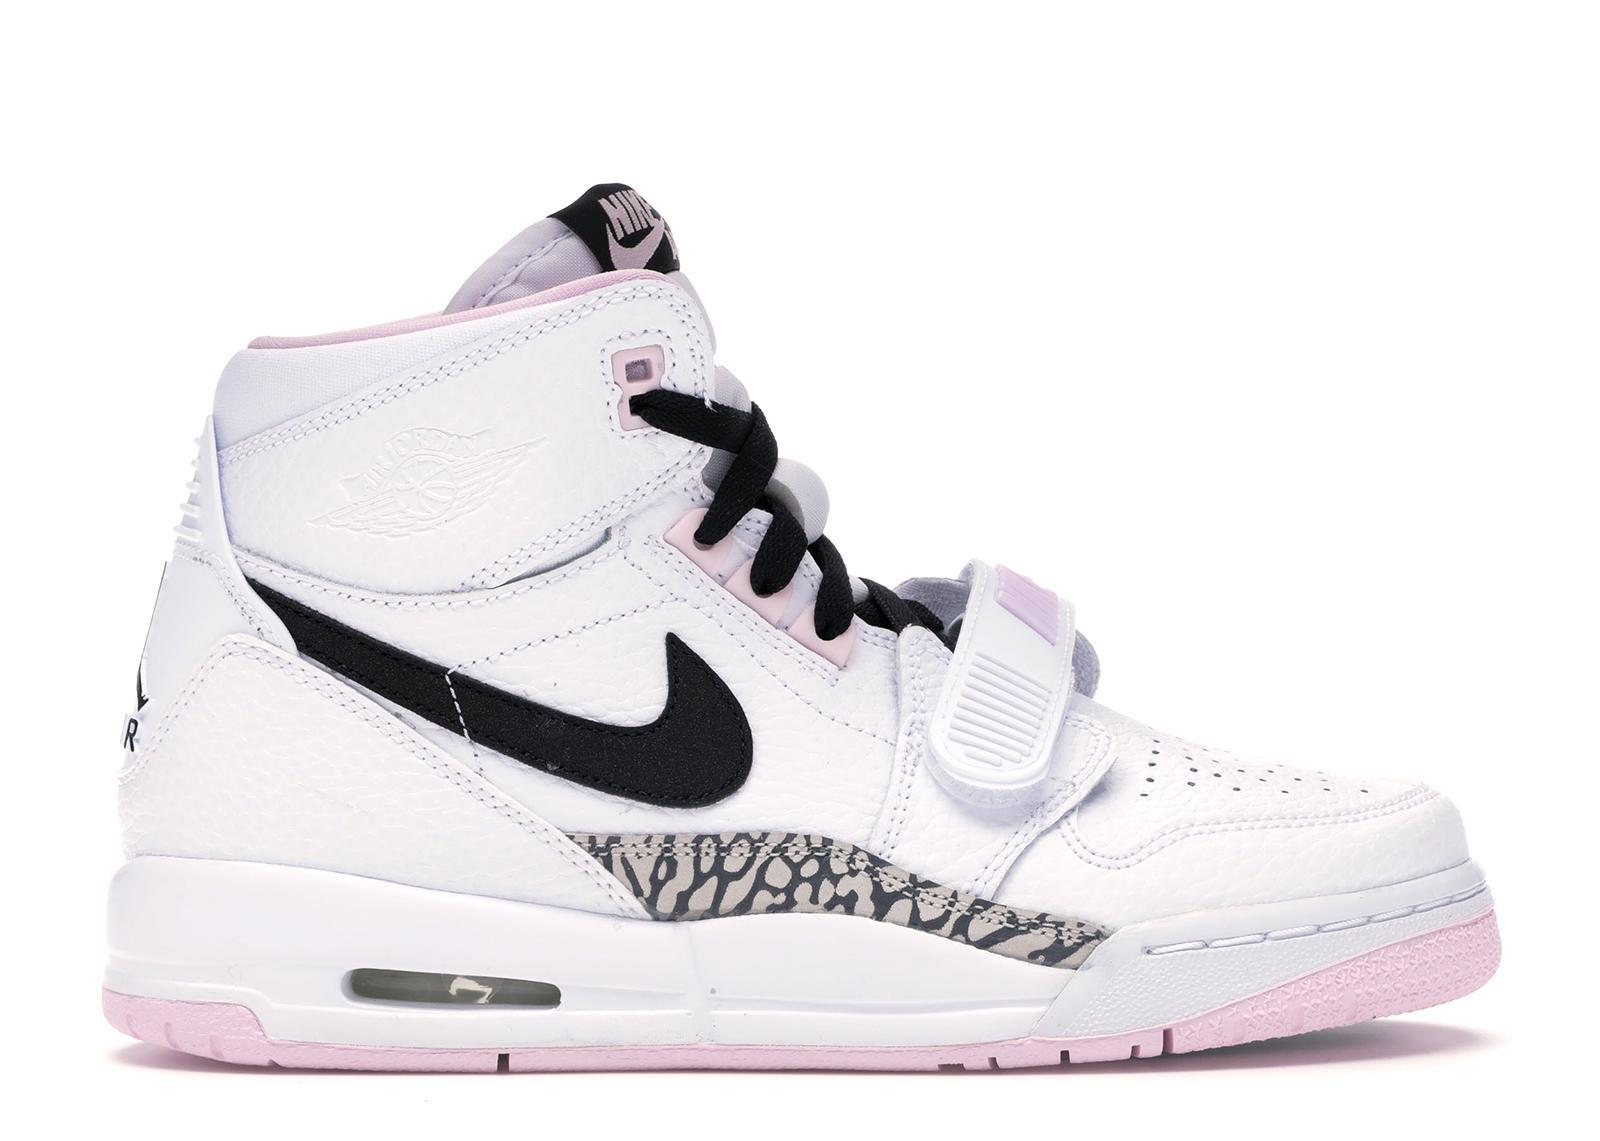 d3a2164c Nike Legacy 312 White Black Pink Foam (gs) in White for Men - Lyst